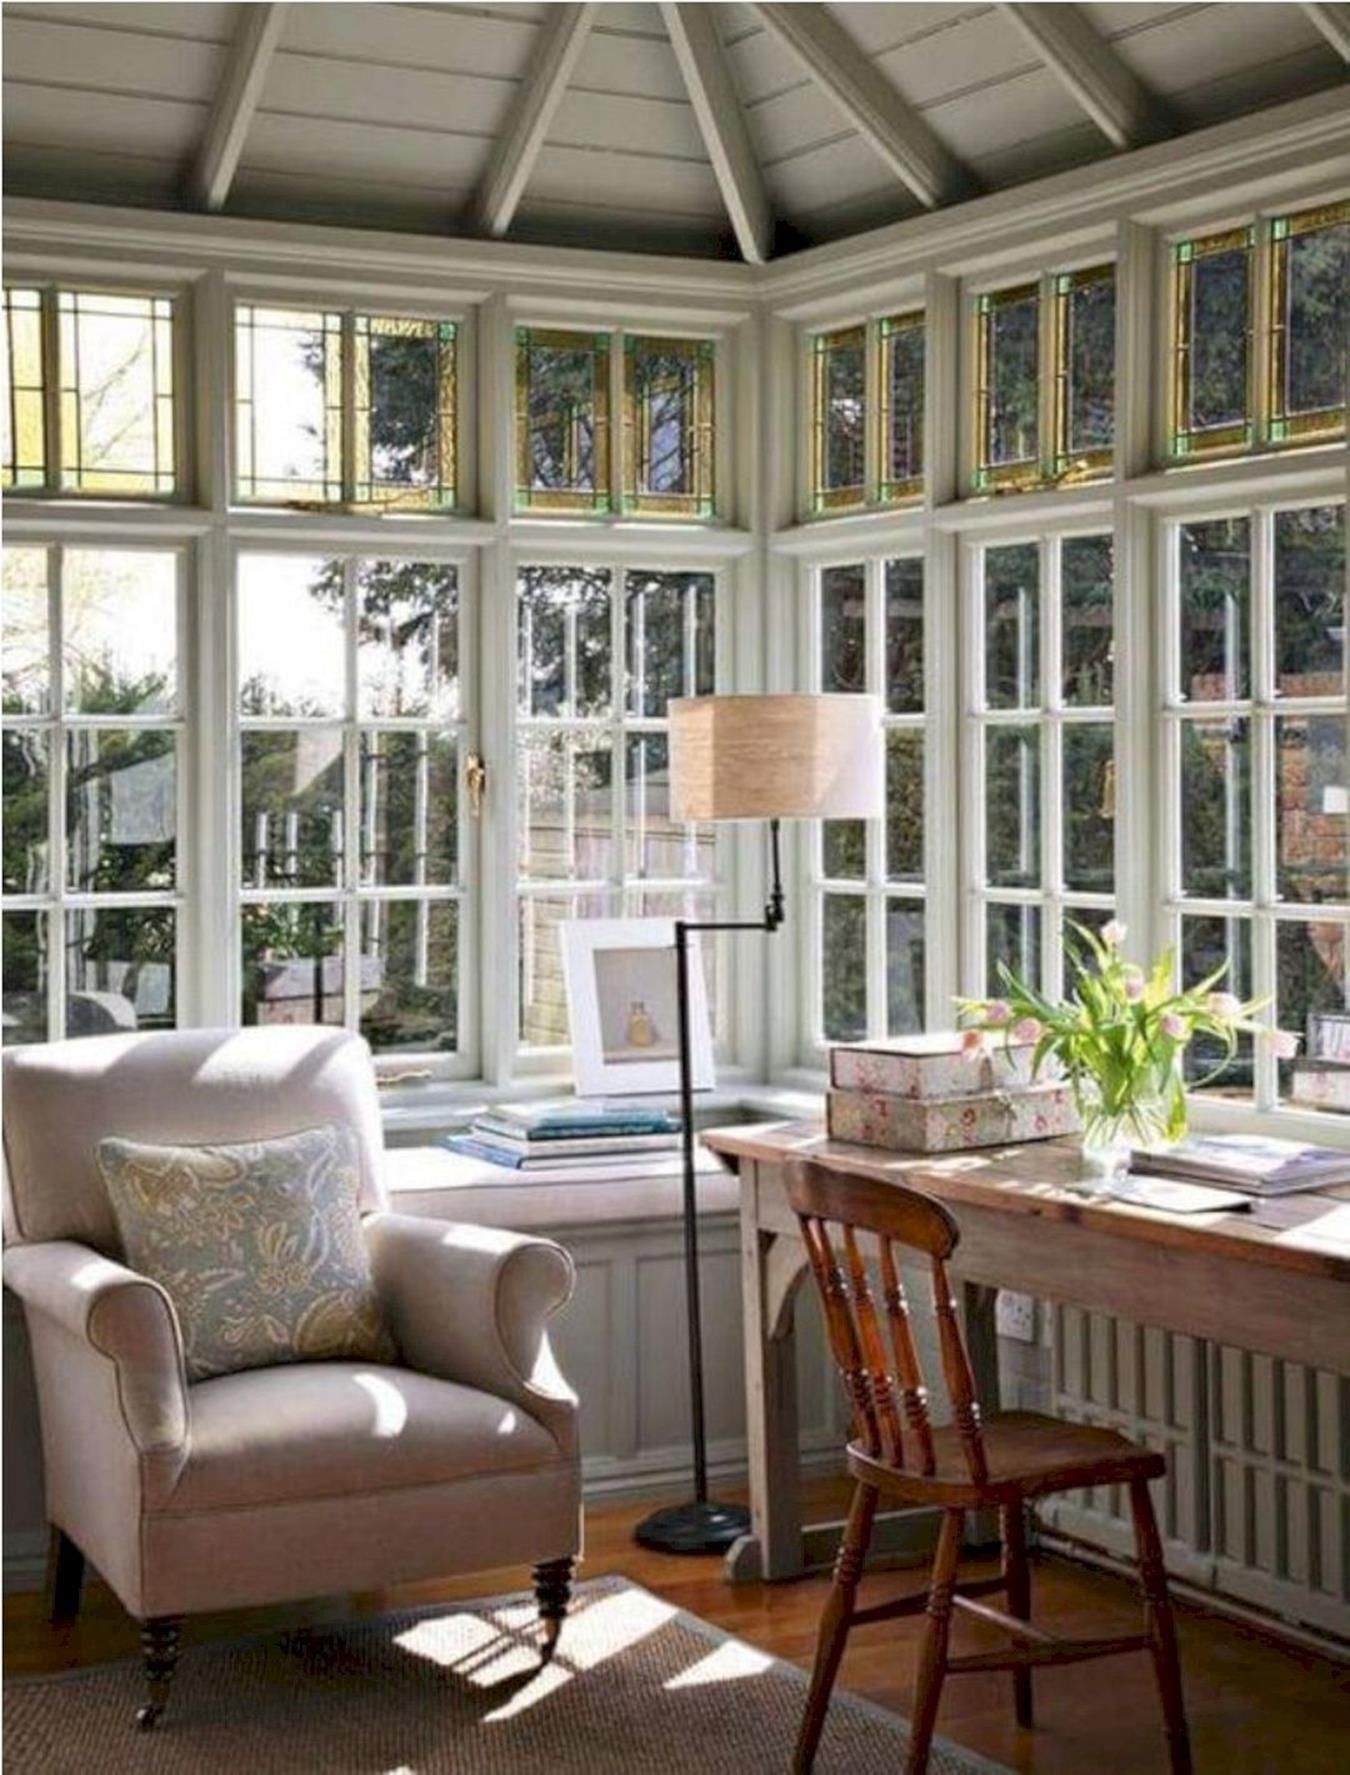 30 Amazing Small Conservatory Interior Design Ideas